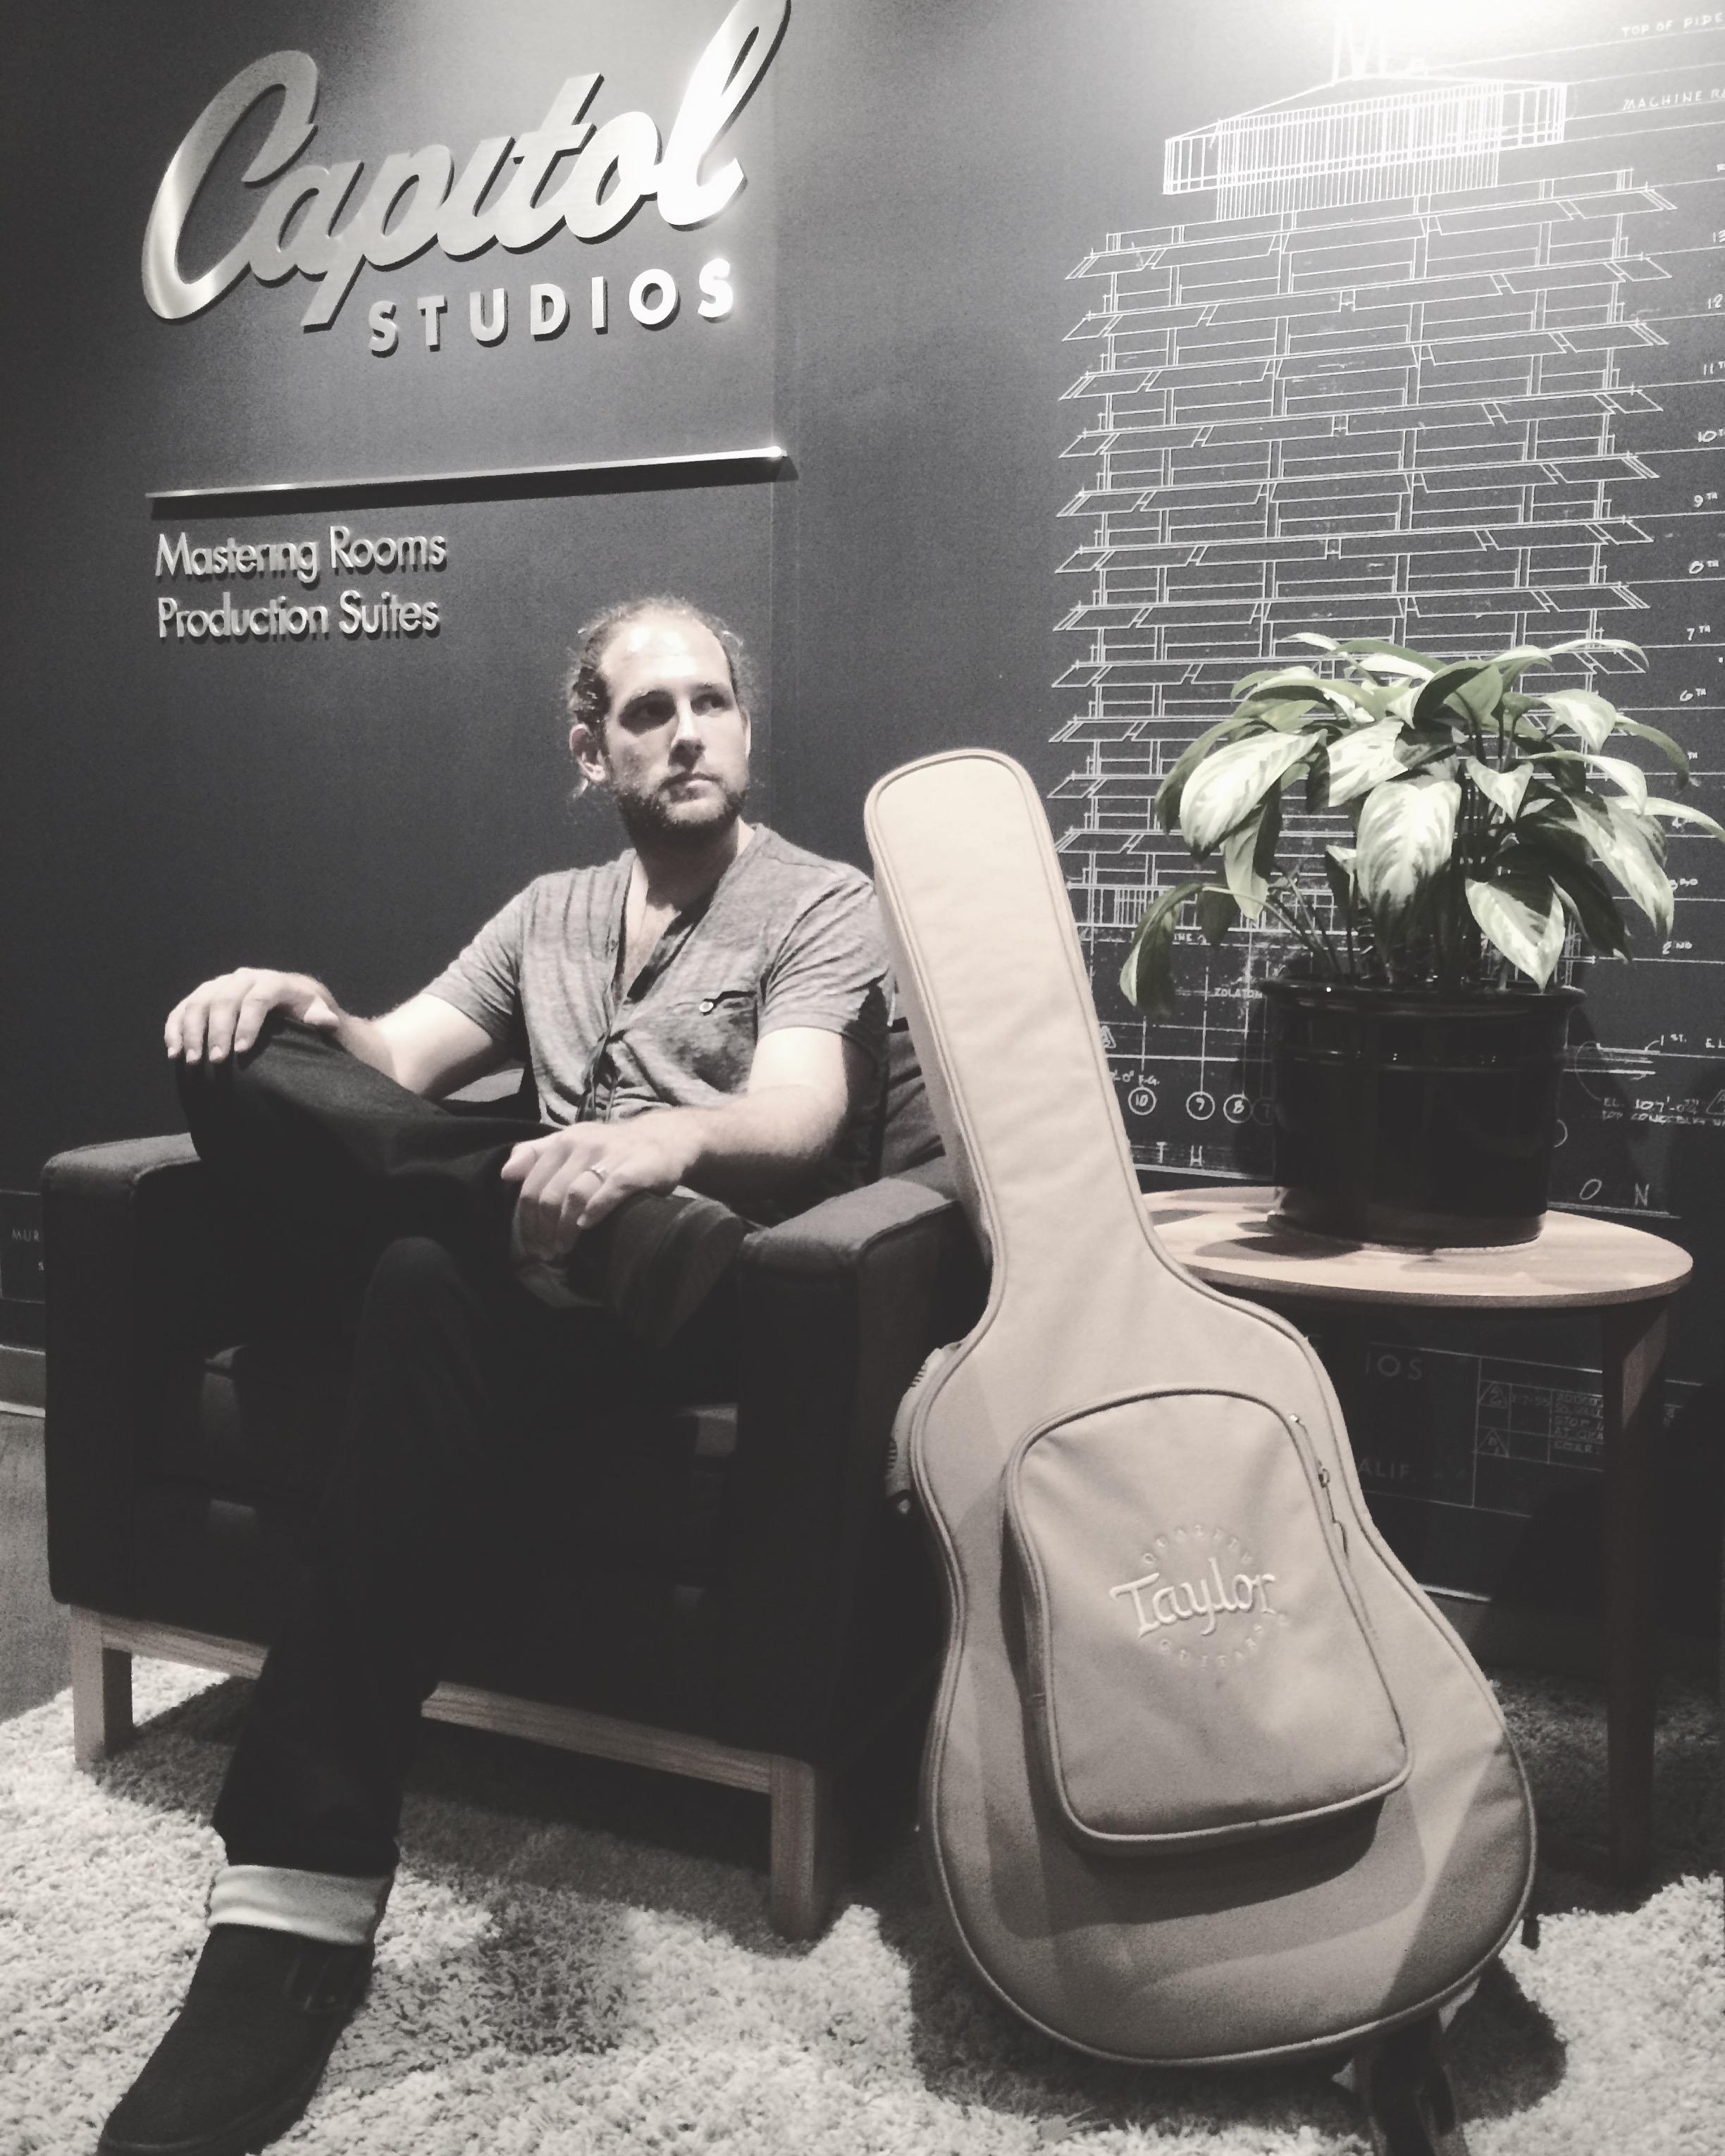 Waiting to record at Capitol Studios